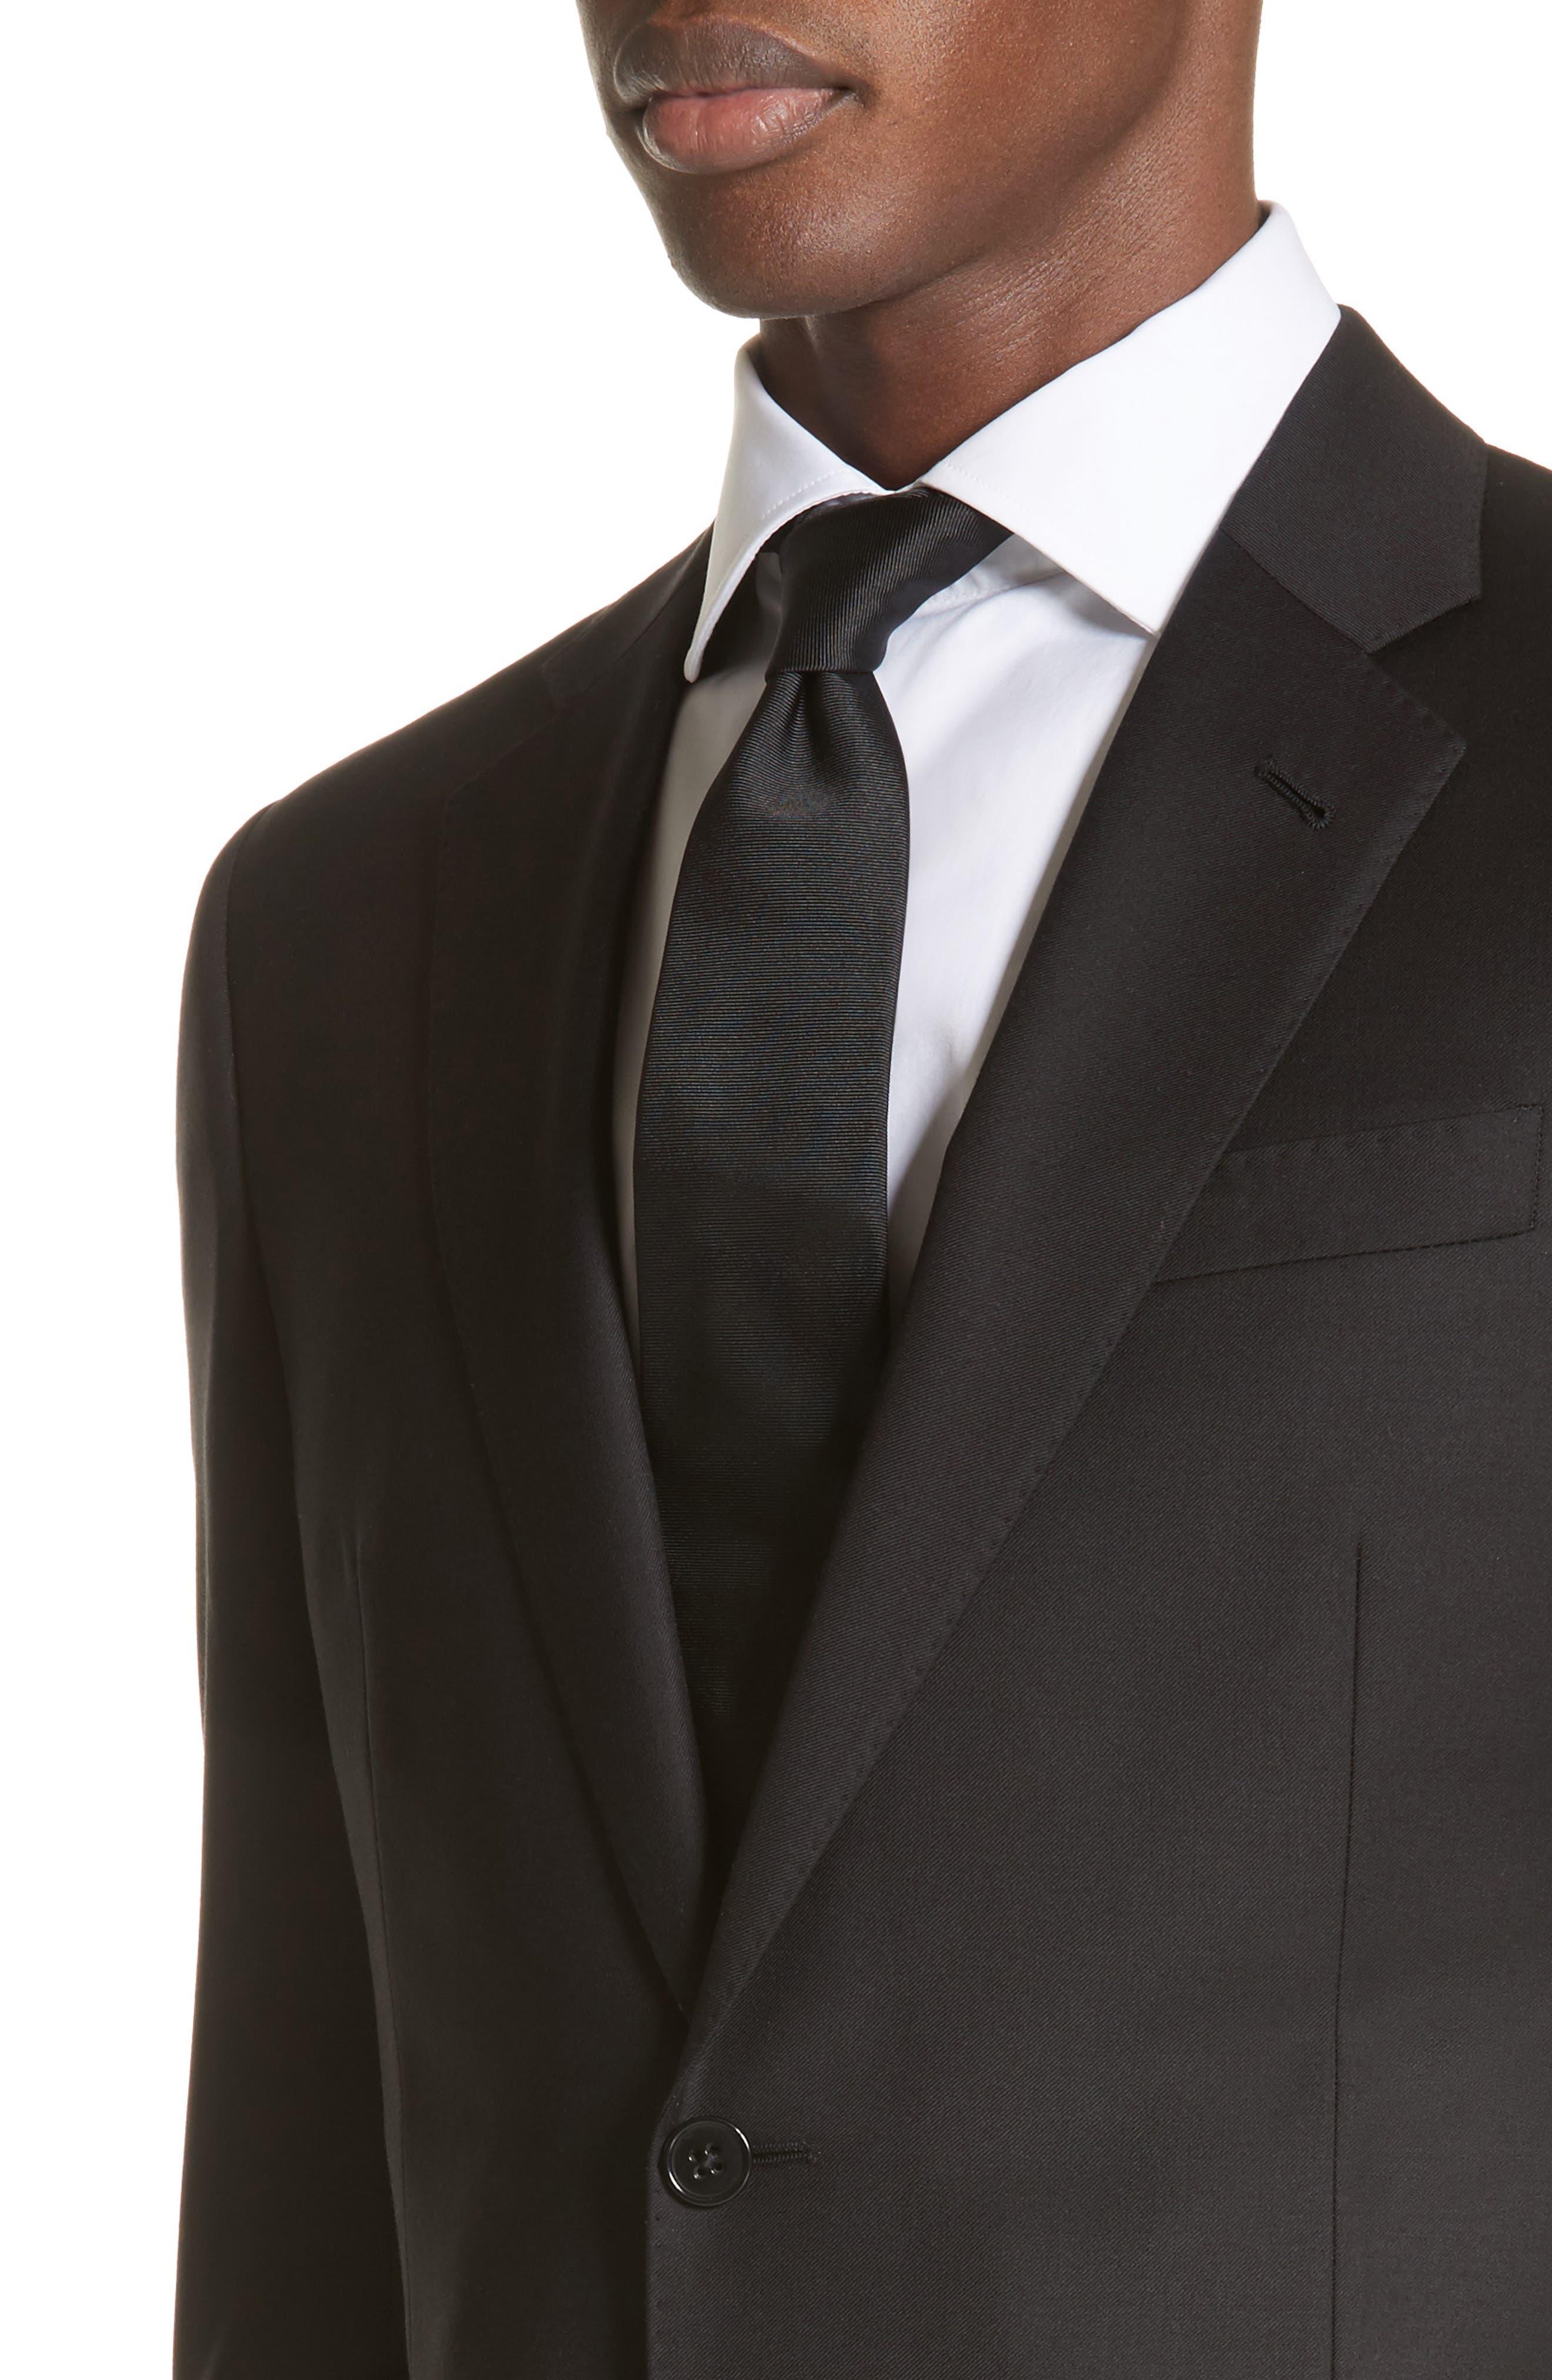 EMPORIO ARMANI, Trim Fit Solid Wool Suit, Alternate thumbnail 4, color, BLACK